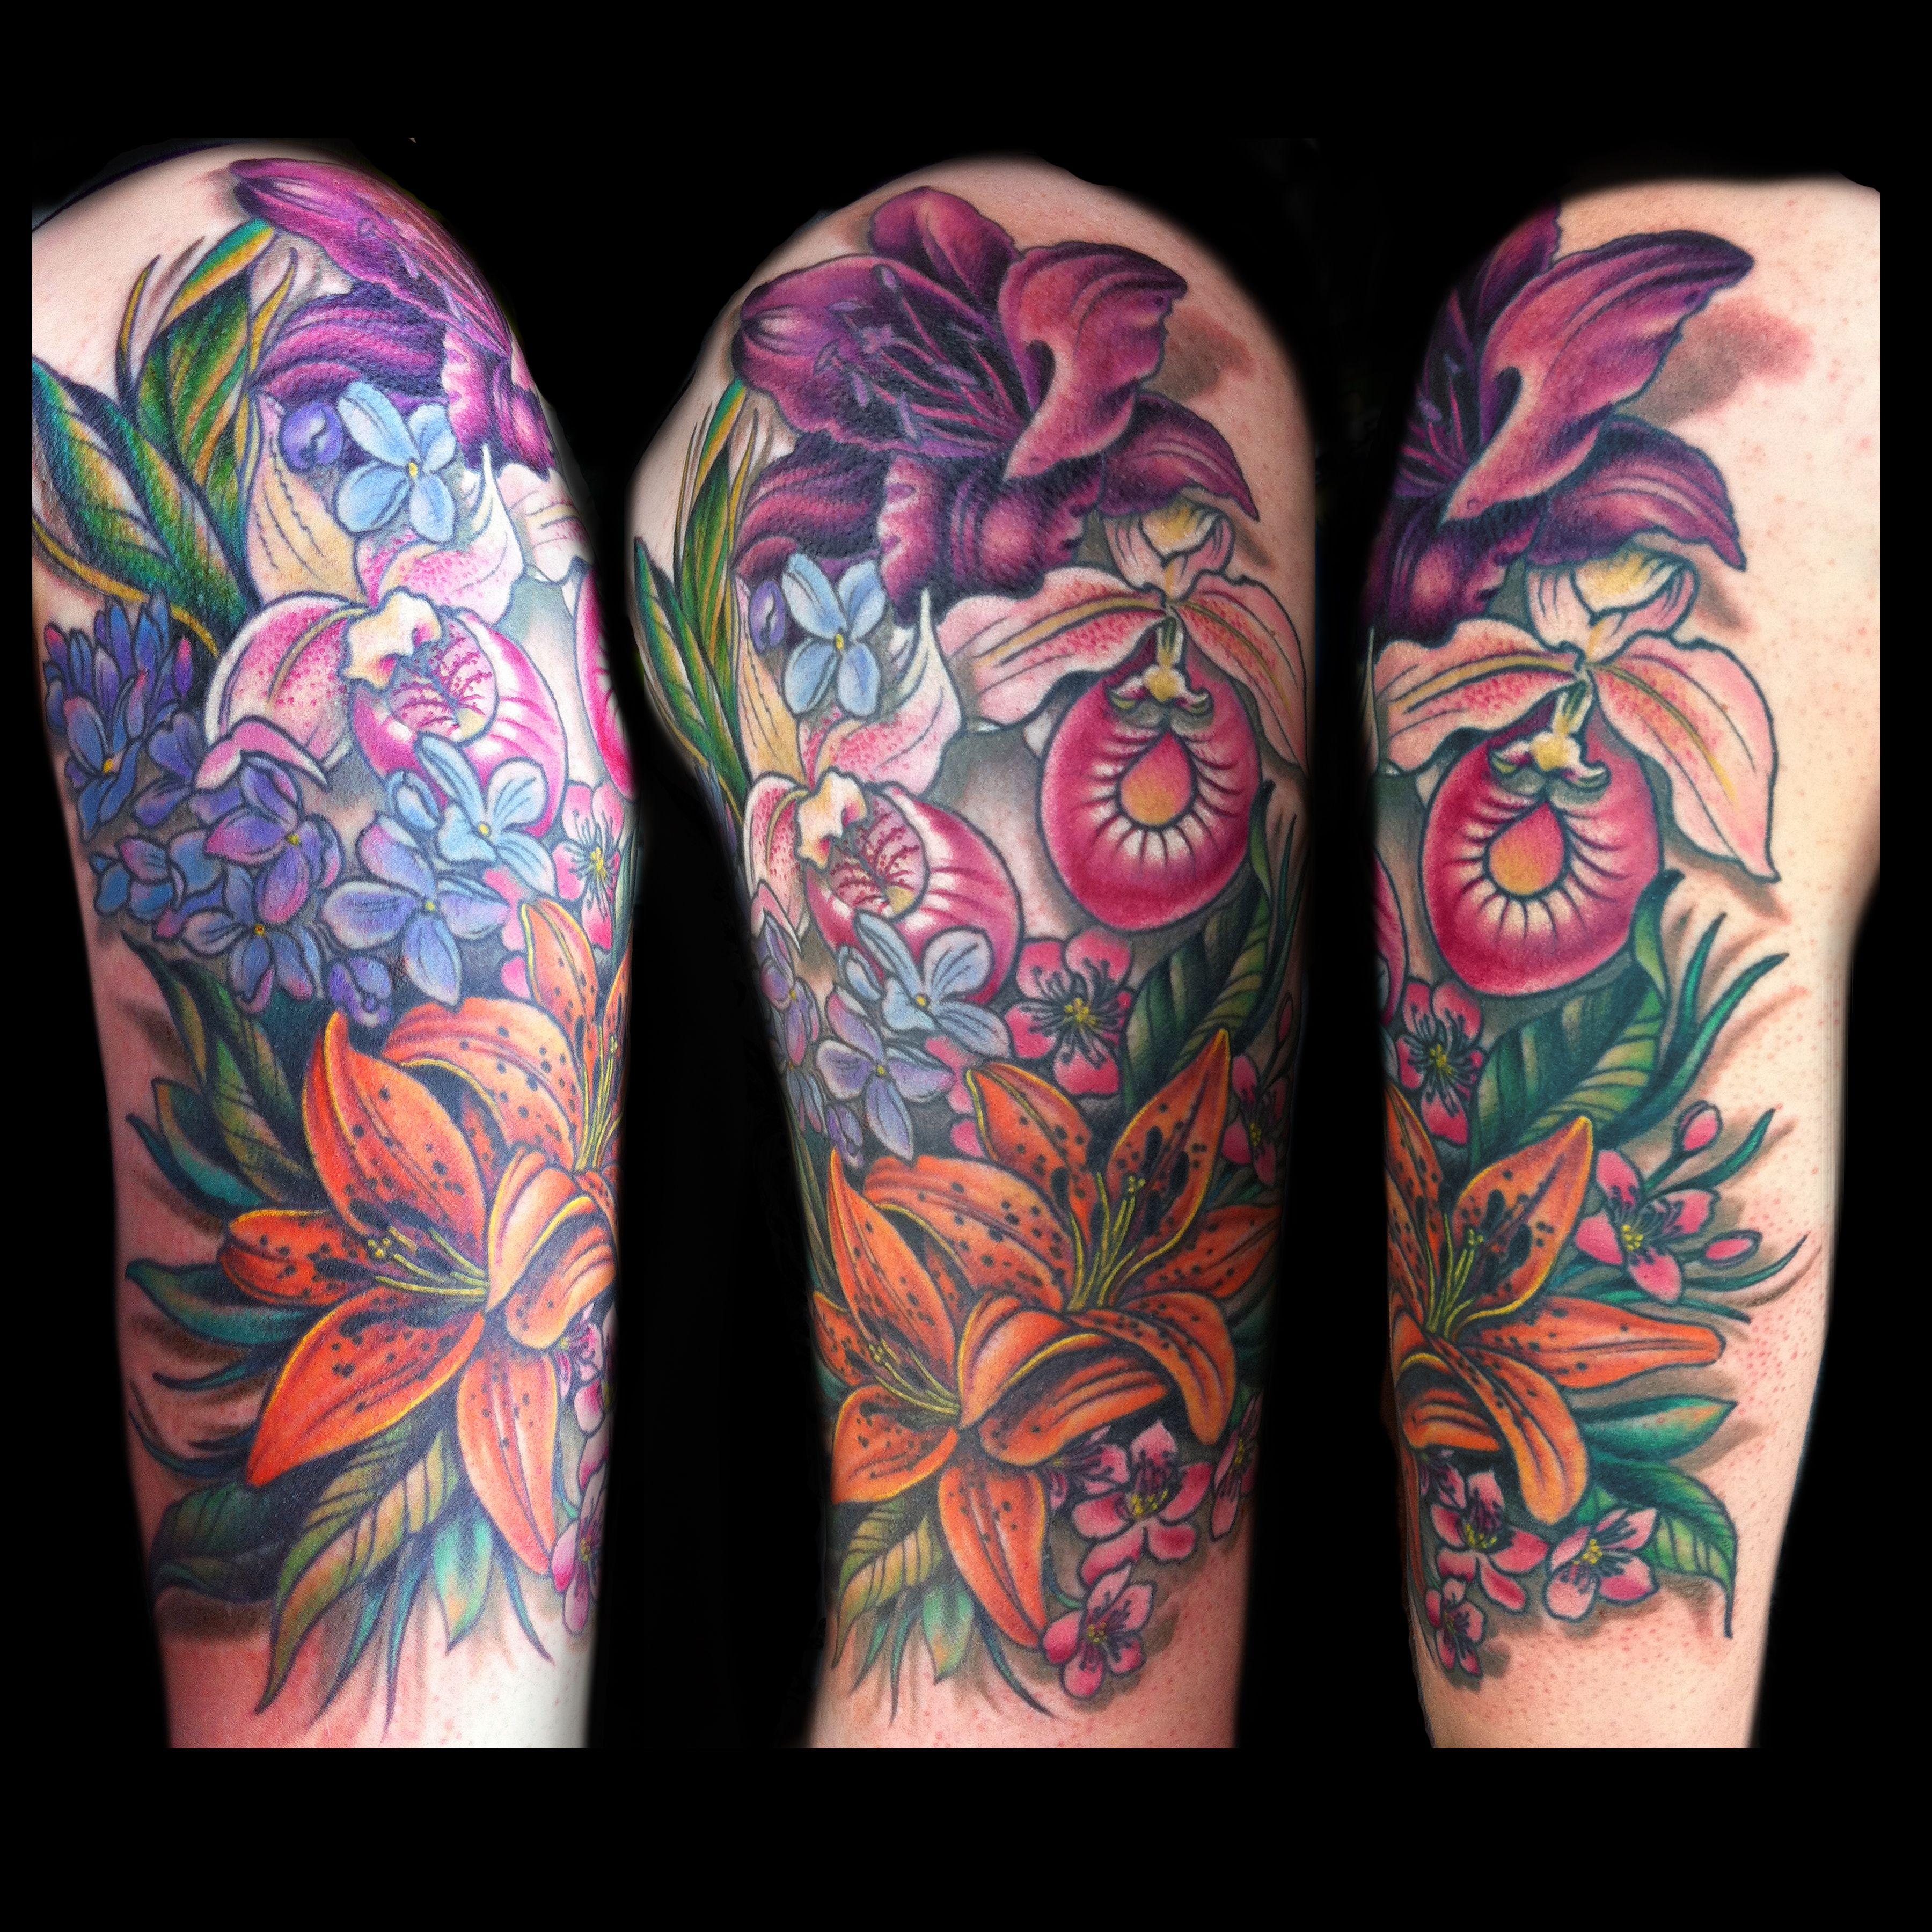 Sick Tattoo Sleeves Ffebffaffe